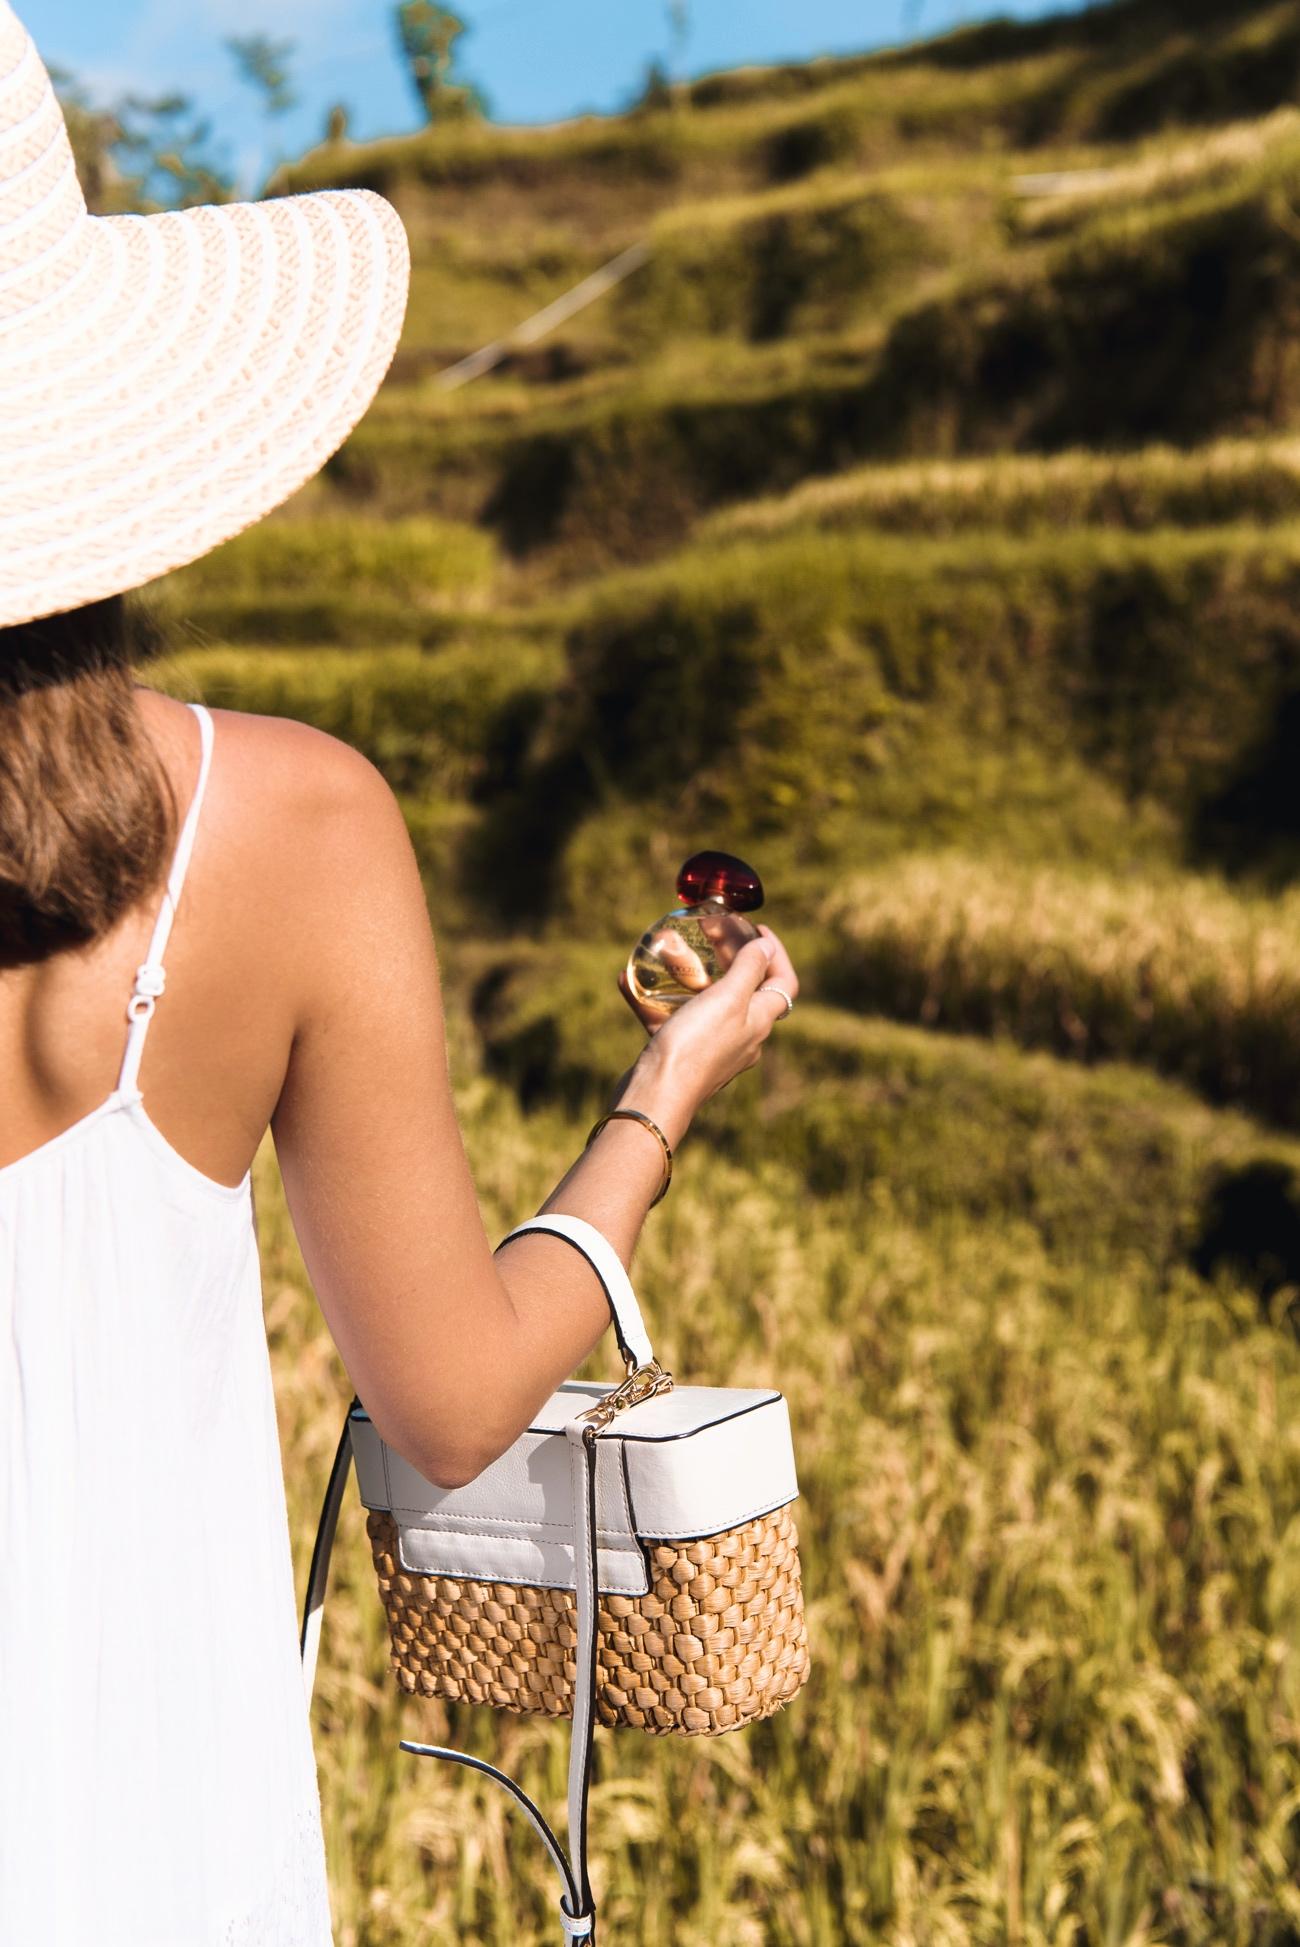 strohtasche-michael-kors-straw-bag-summer-trend-2017-blogger-style-fashiioncarpet